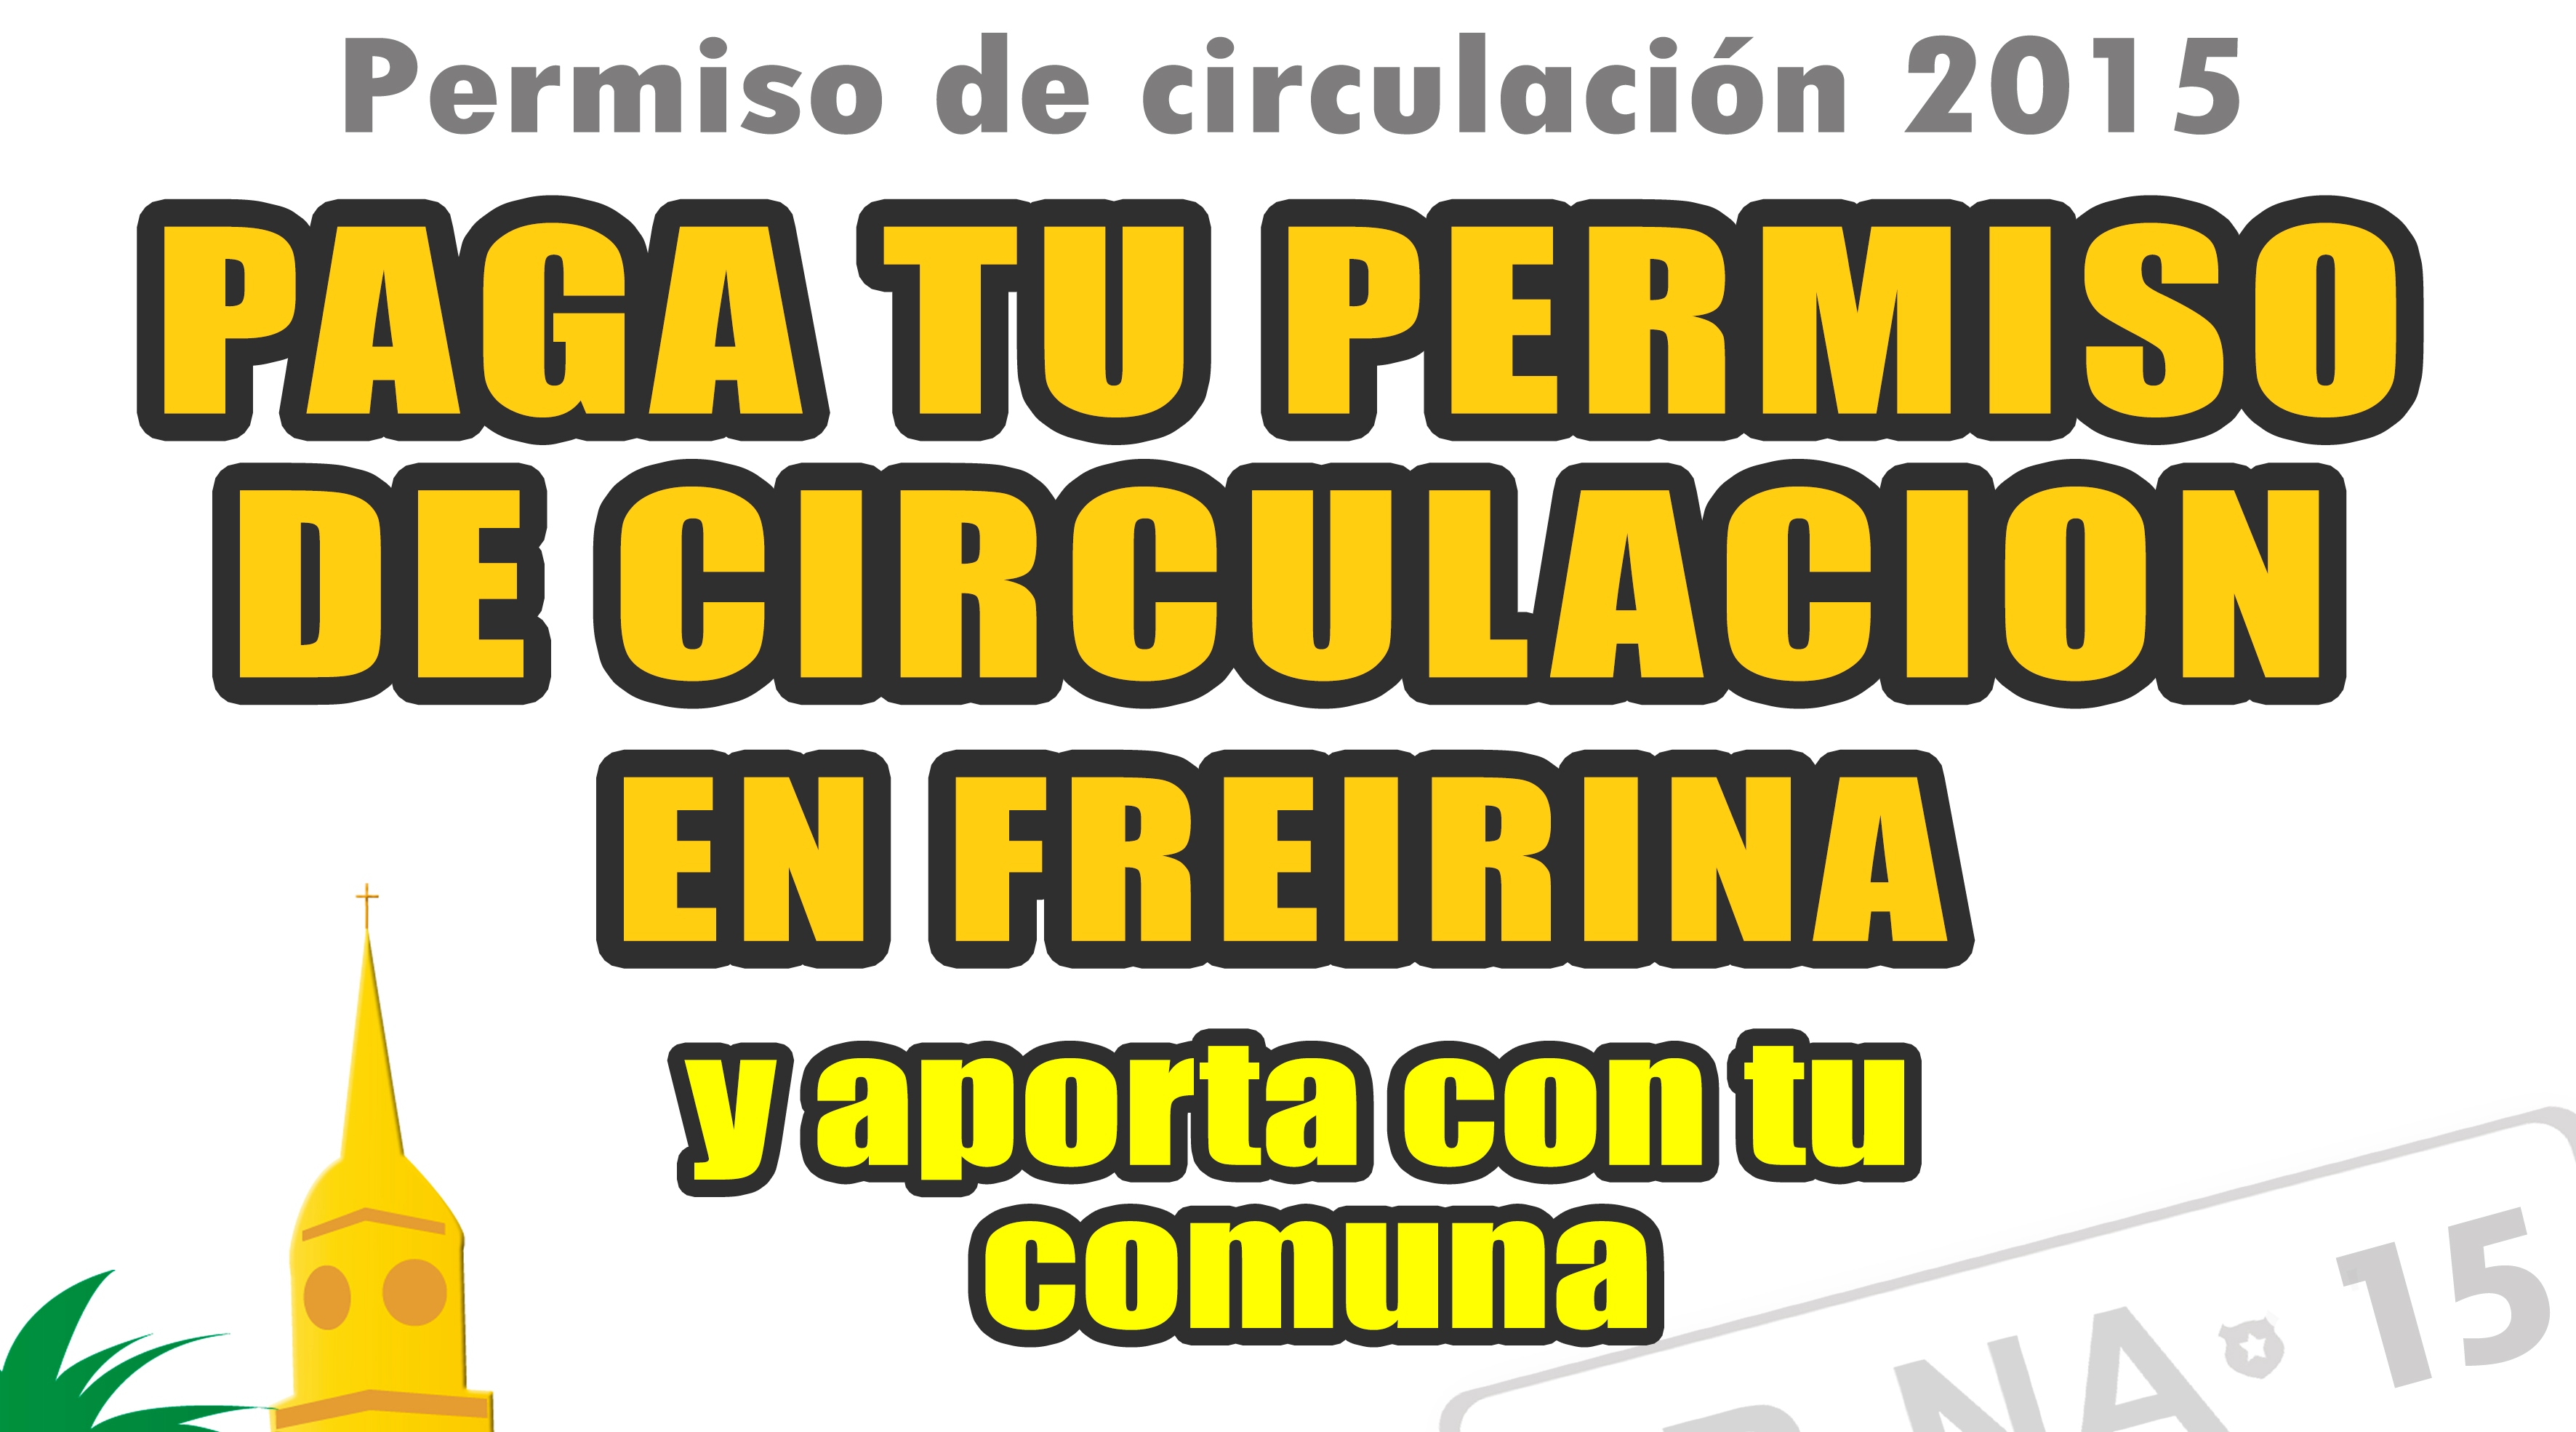 Freirina invita a pagar permiso de circulación en la comuna